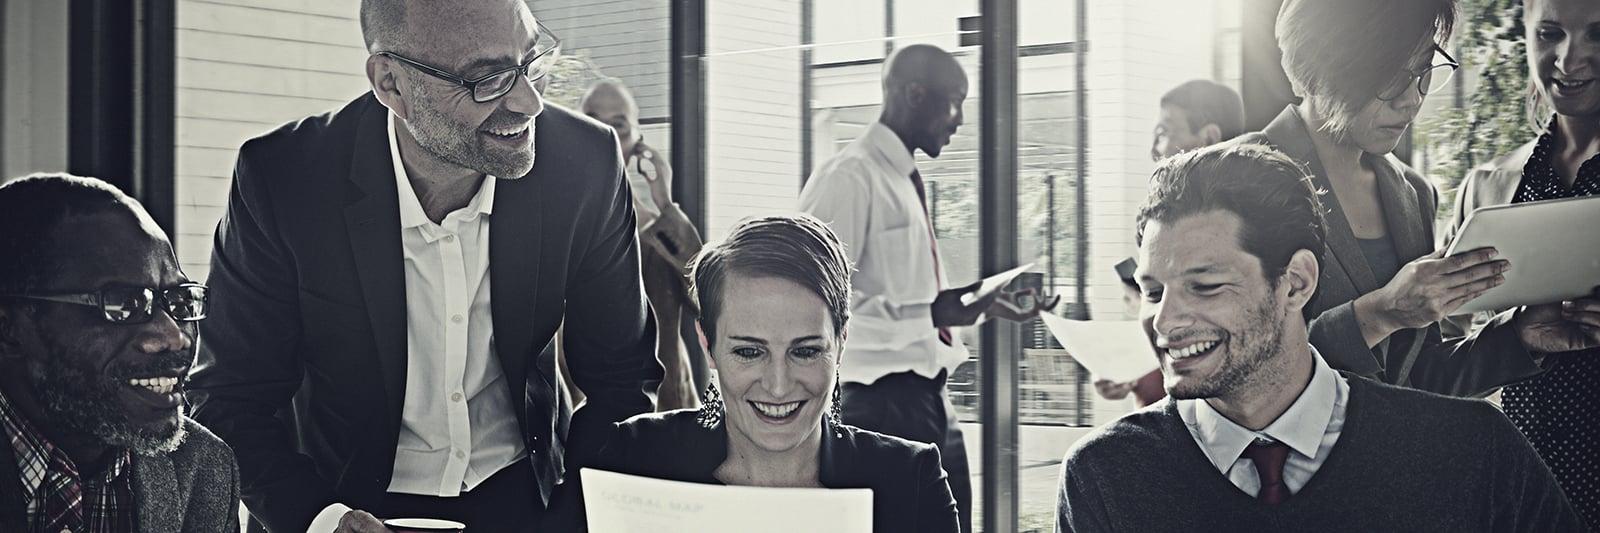 bigstock-Diversity-Business-People-Disc-86314160_hero